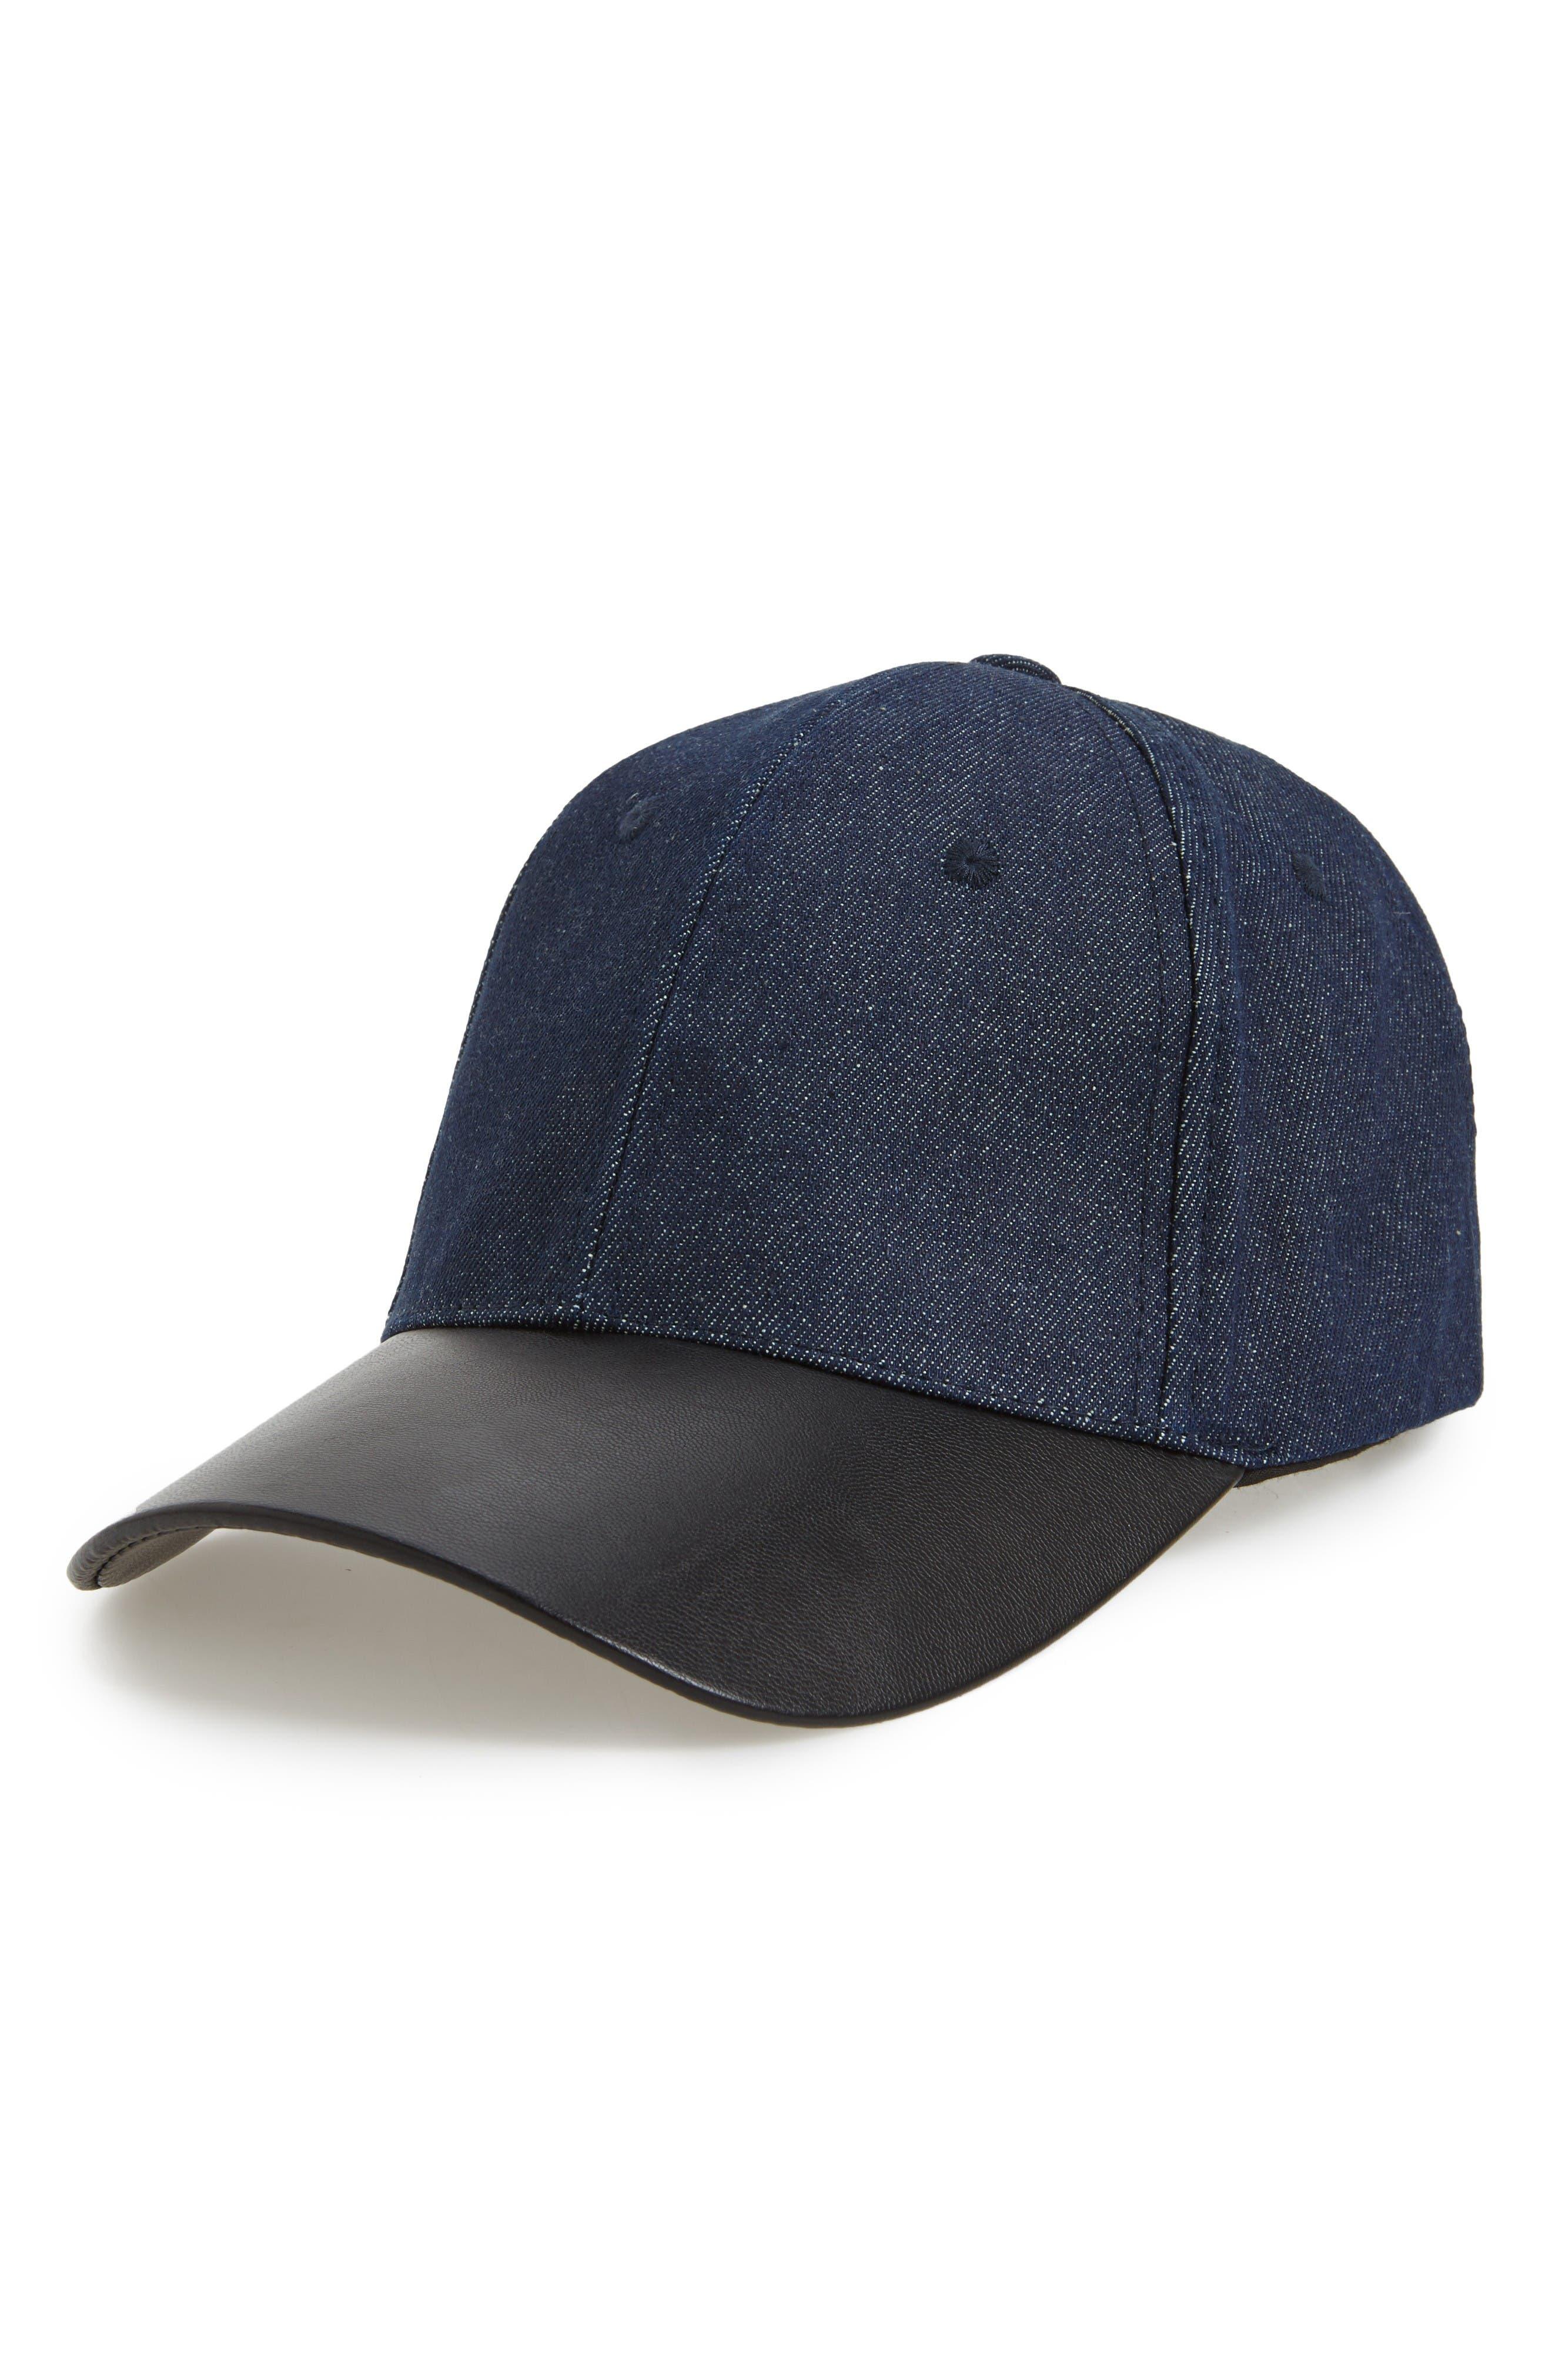 Alternate Image 1 Selected - Phase 3 Denim Baseball Cap